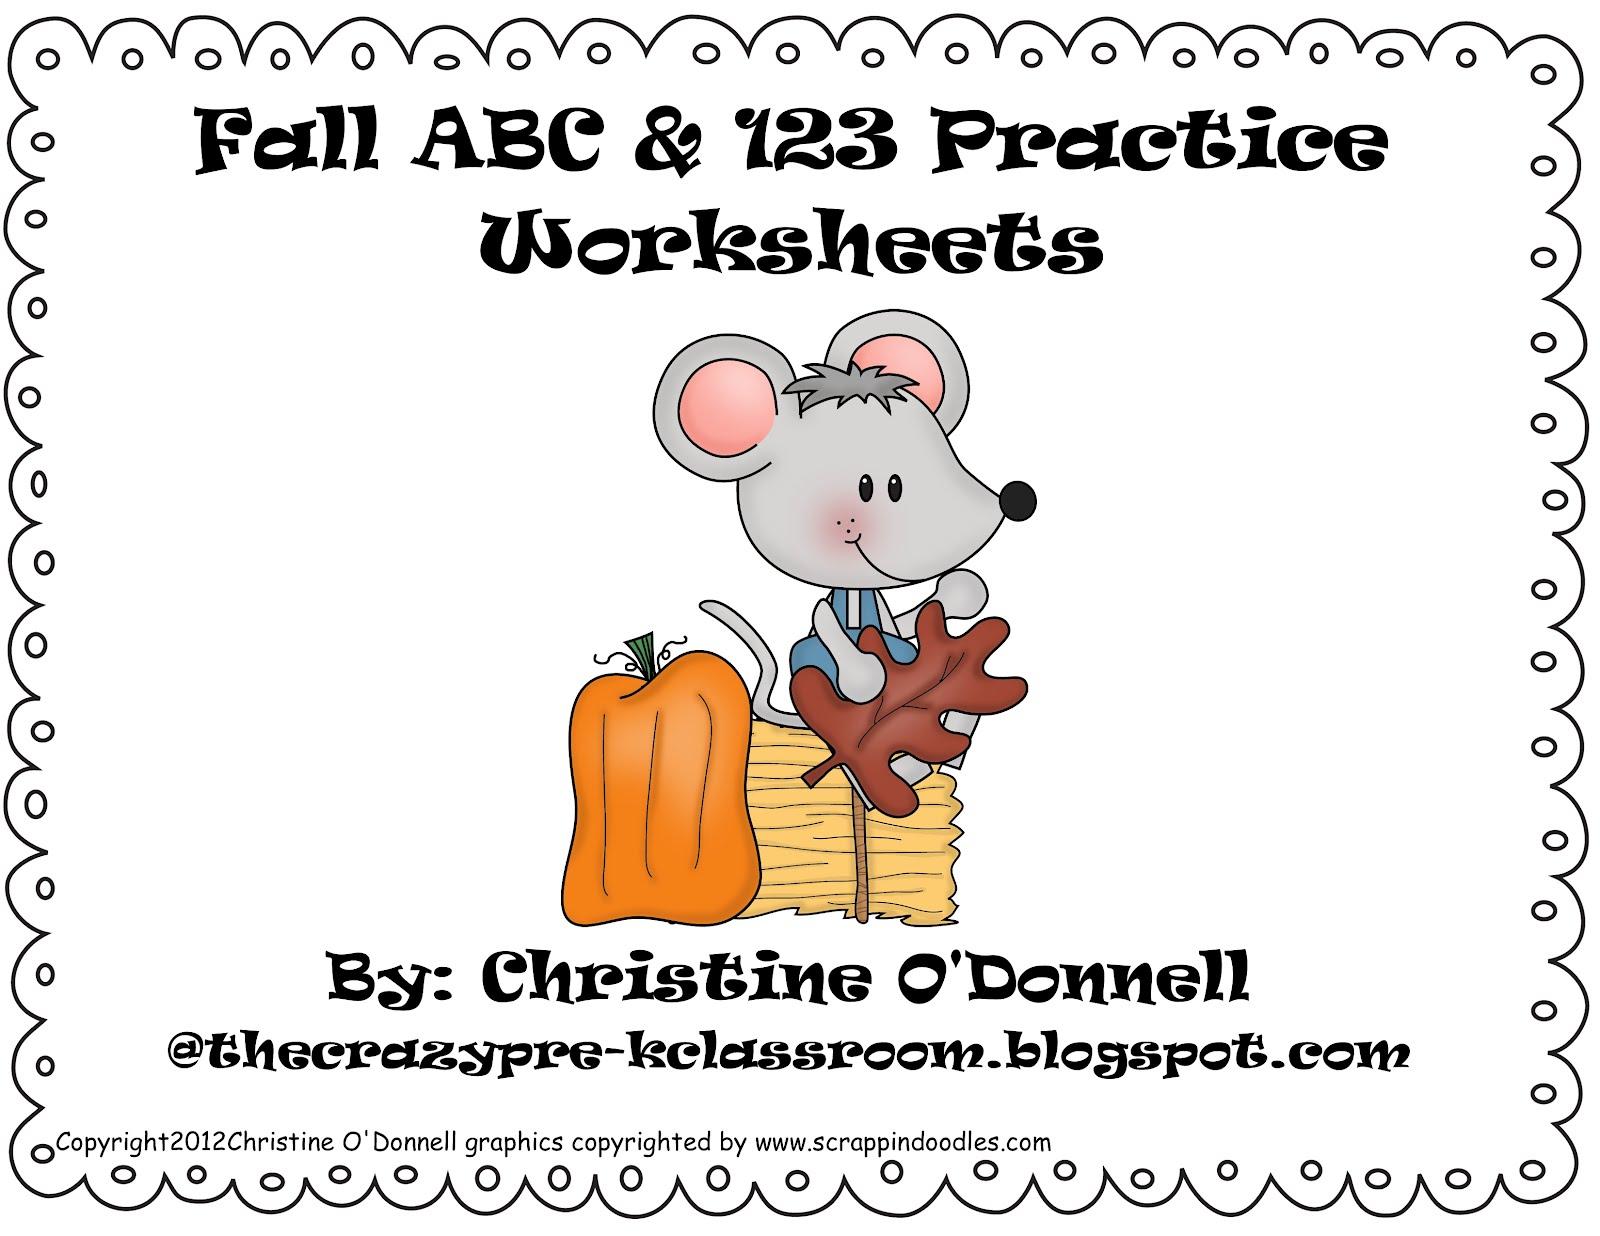 The Crazy Pre-K Classroom: Fall Freebie! Fall Themed ABC